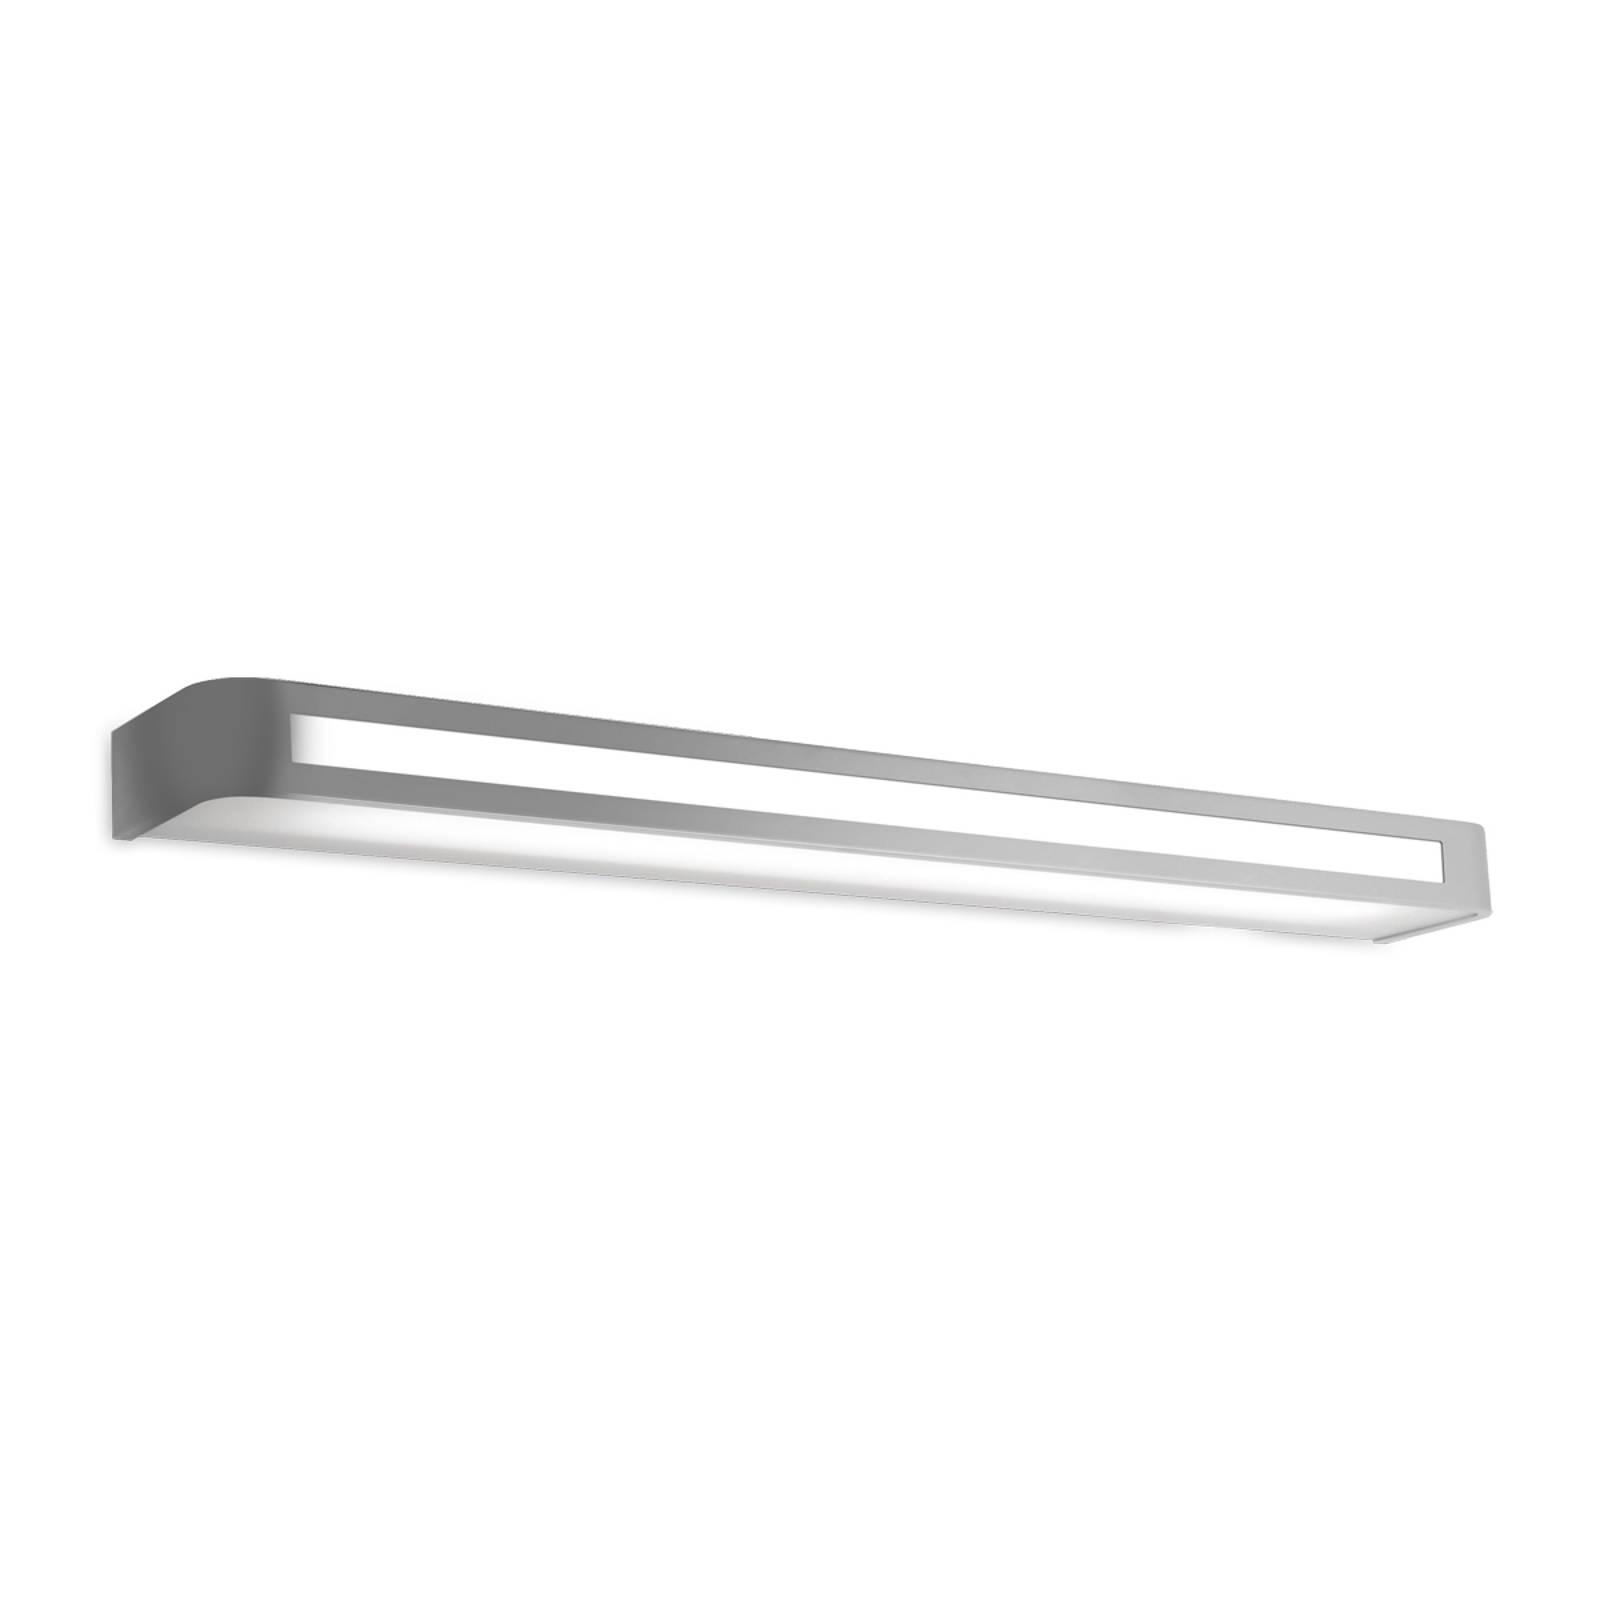 Tijdloze LED wandlamp Arcos, IP20 90 cm, chroom